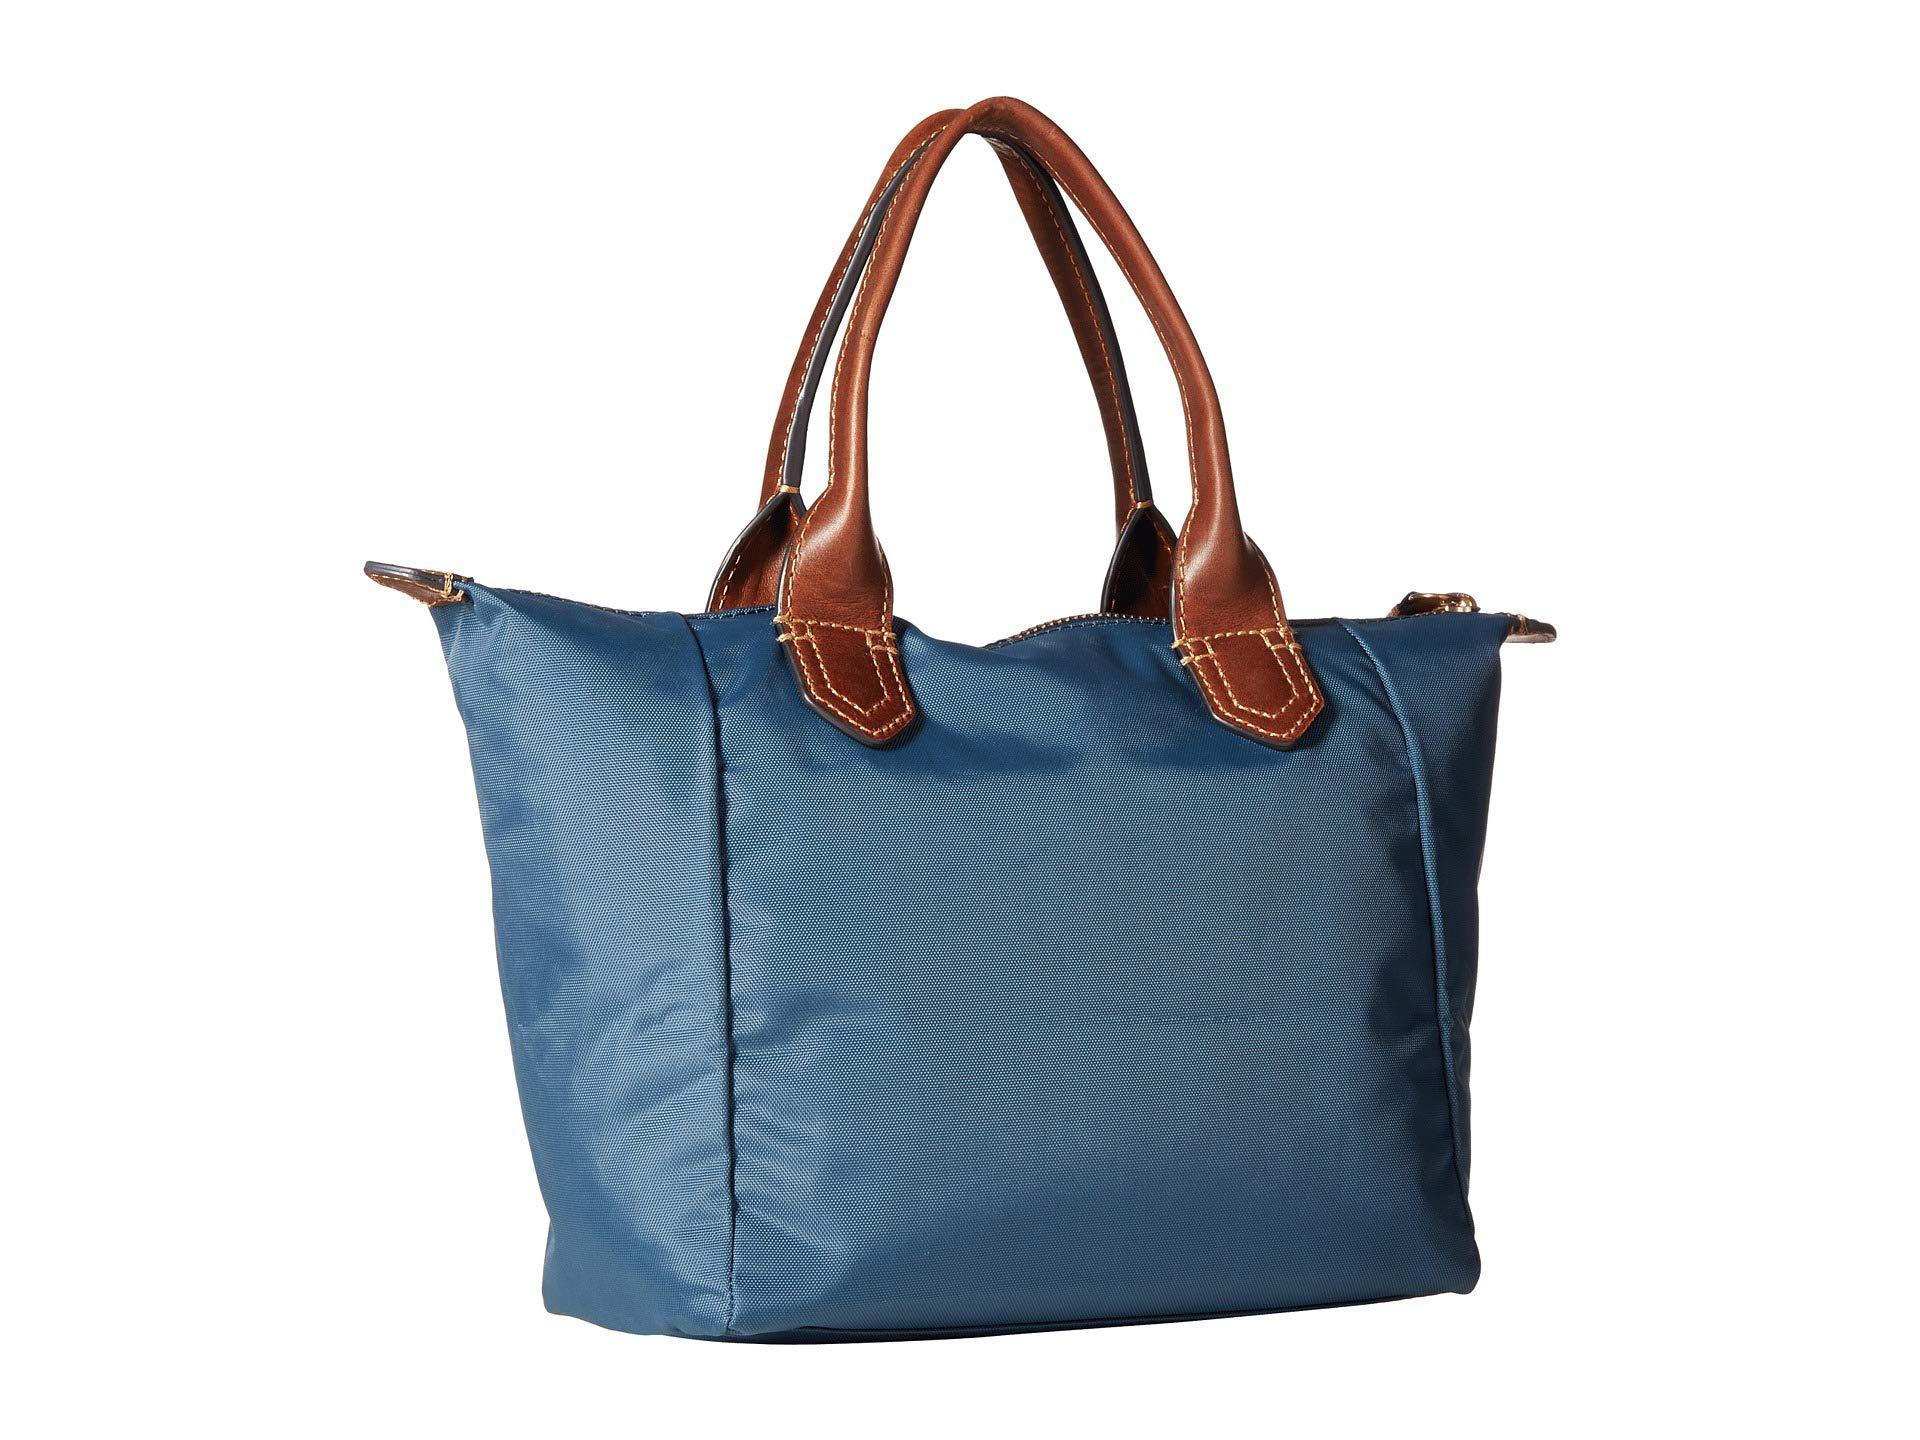 7cacdbcf835 View Fullscreen. Lyst Frye Ivy Small Satchel Pea Nylon Handbags In Blue